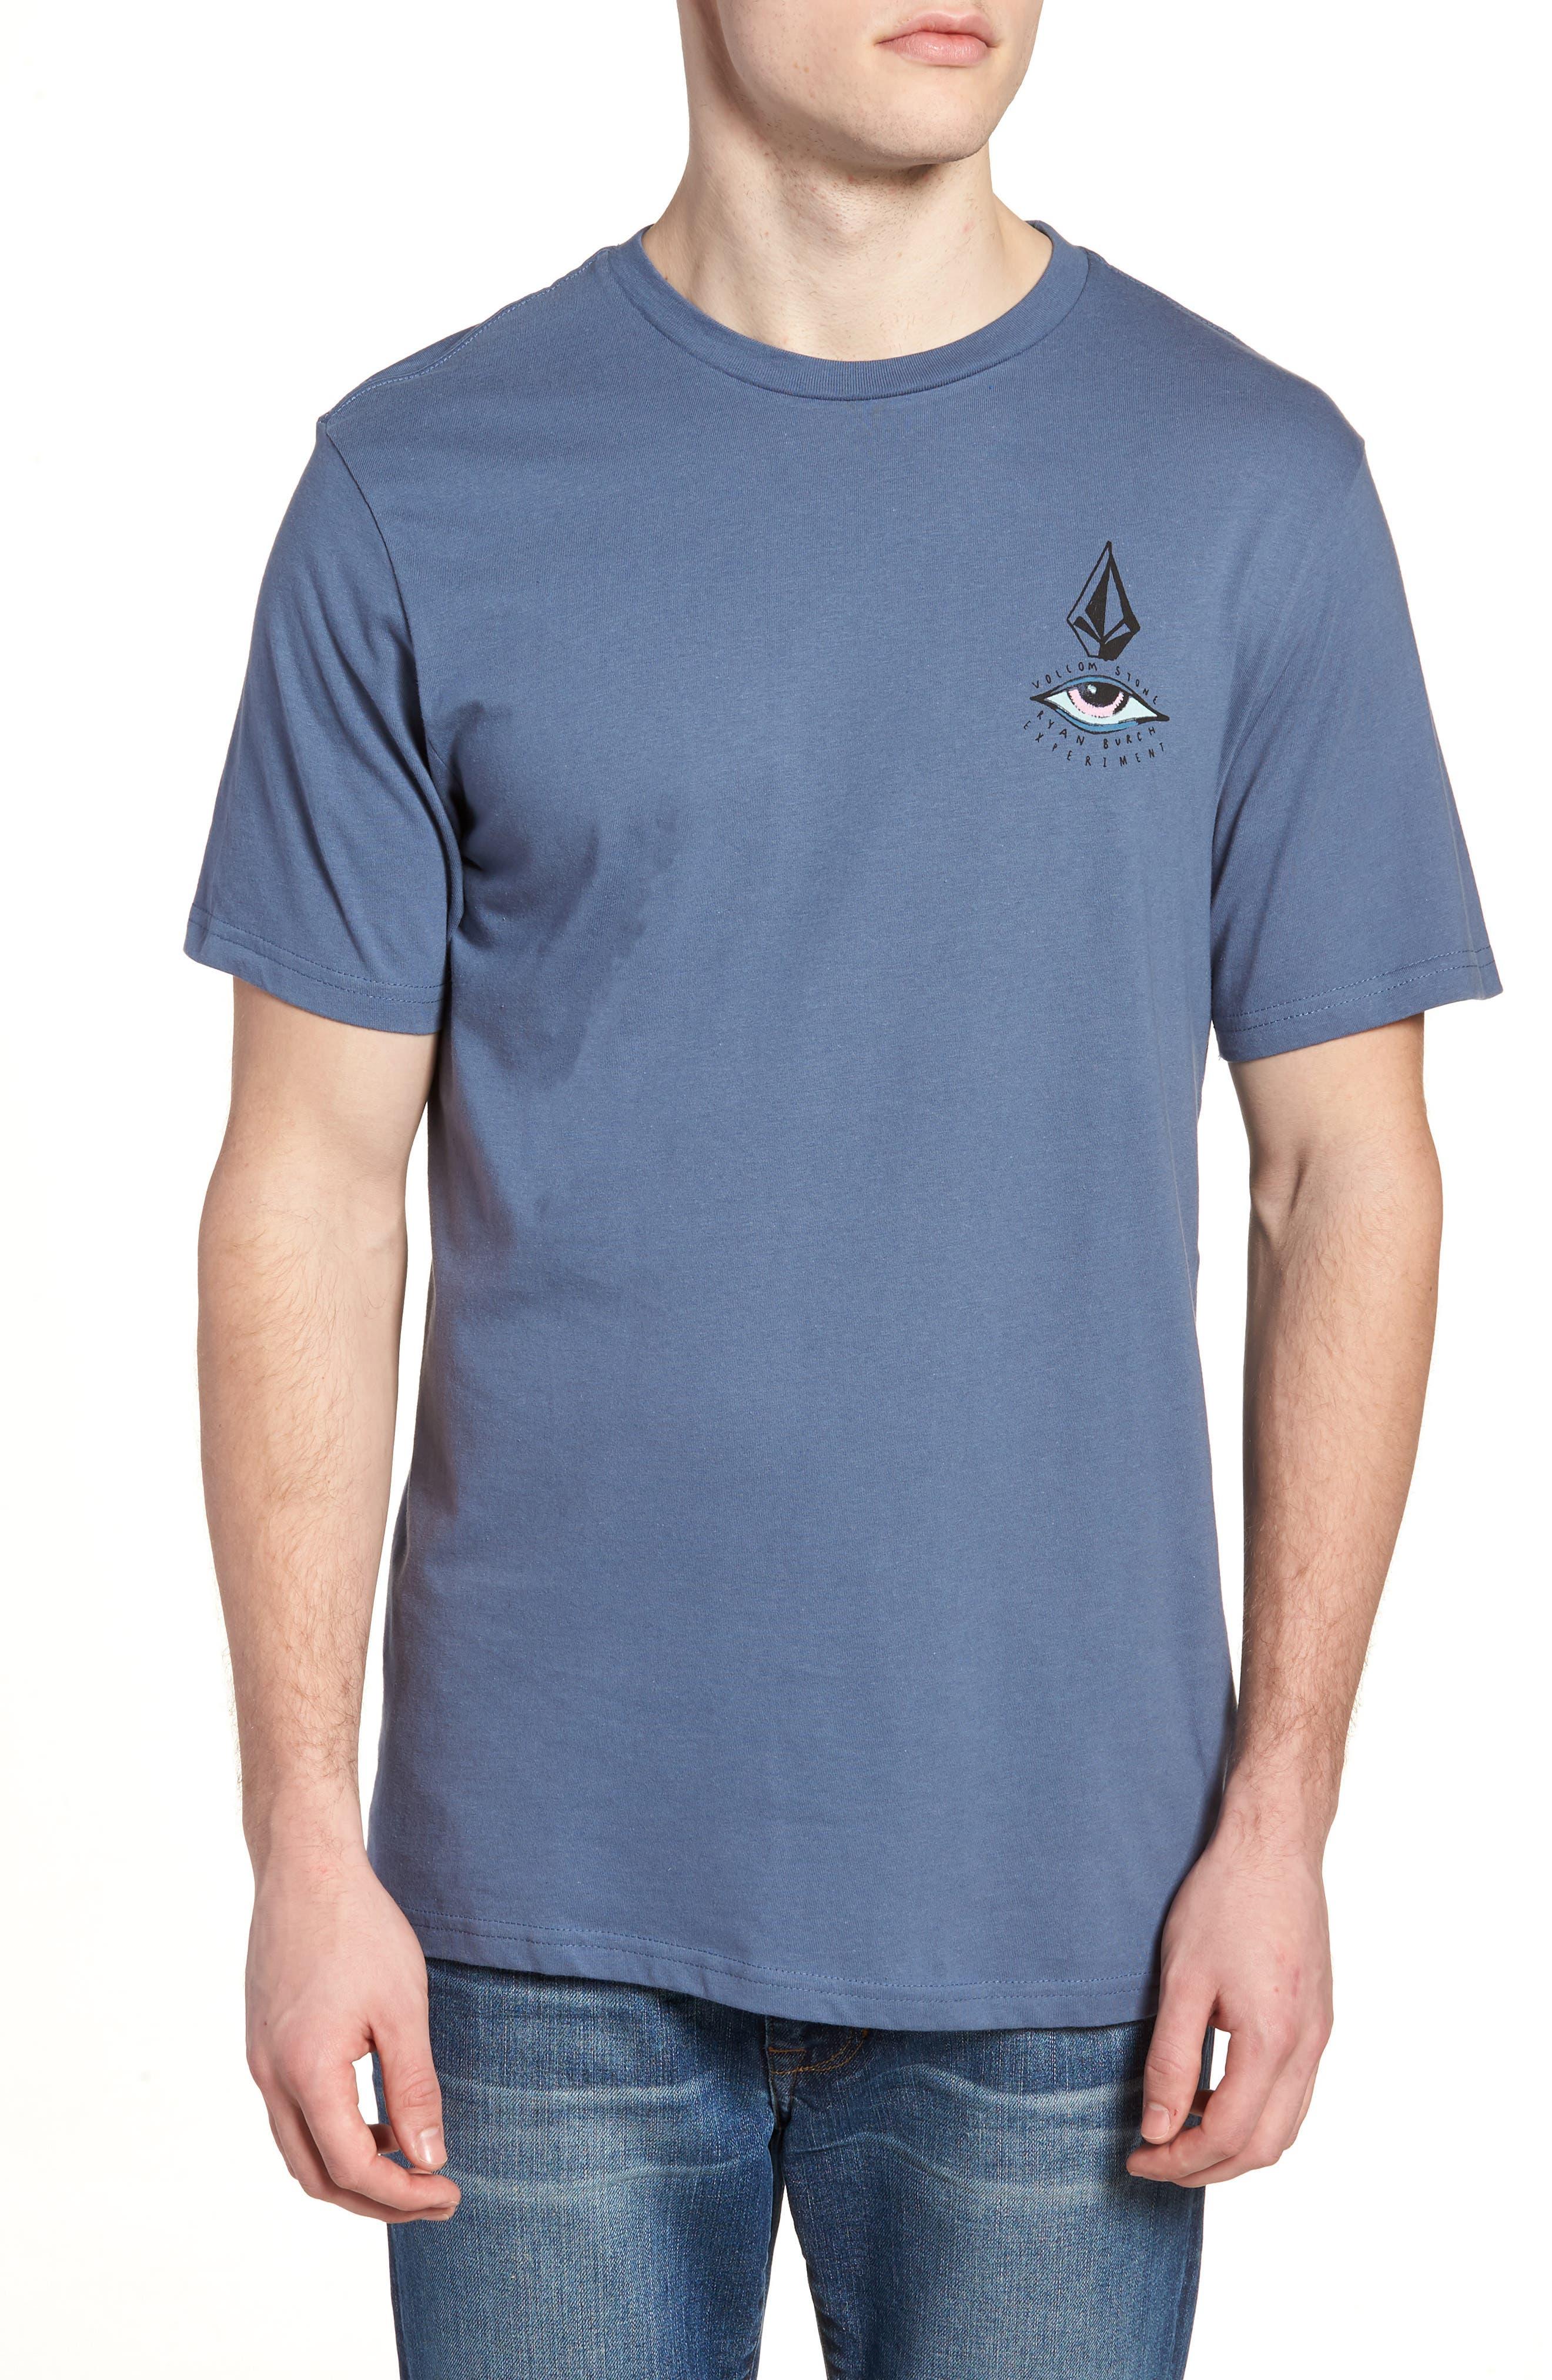 Burch Eye Graphic T-Shirt,                         Main,                         color,